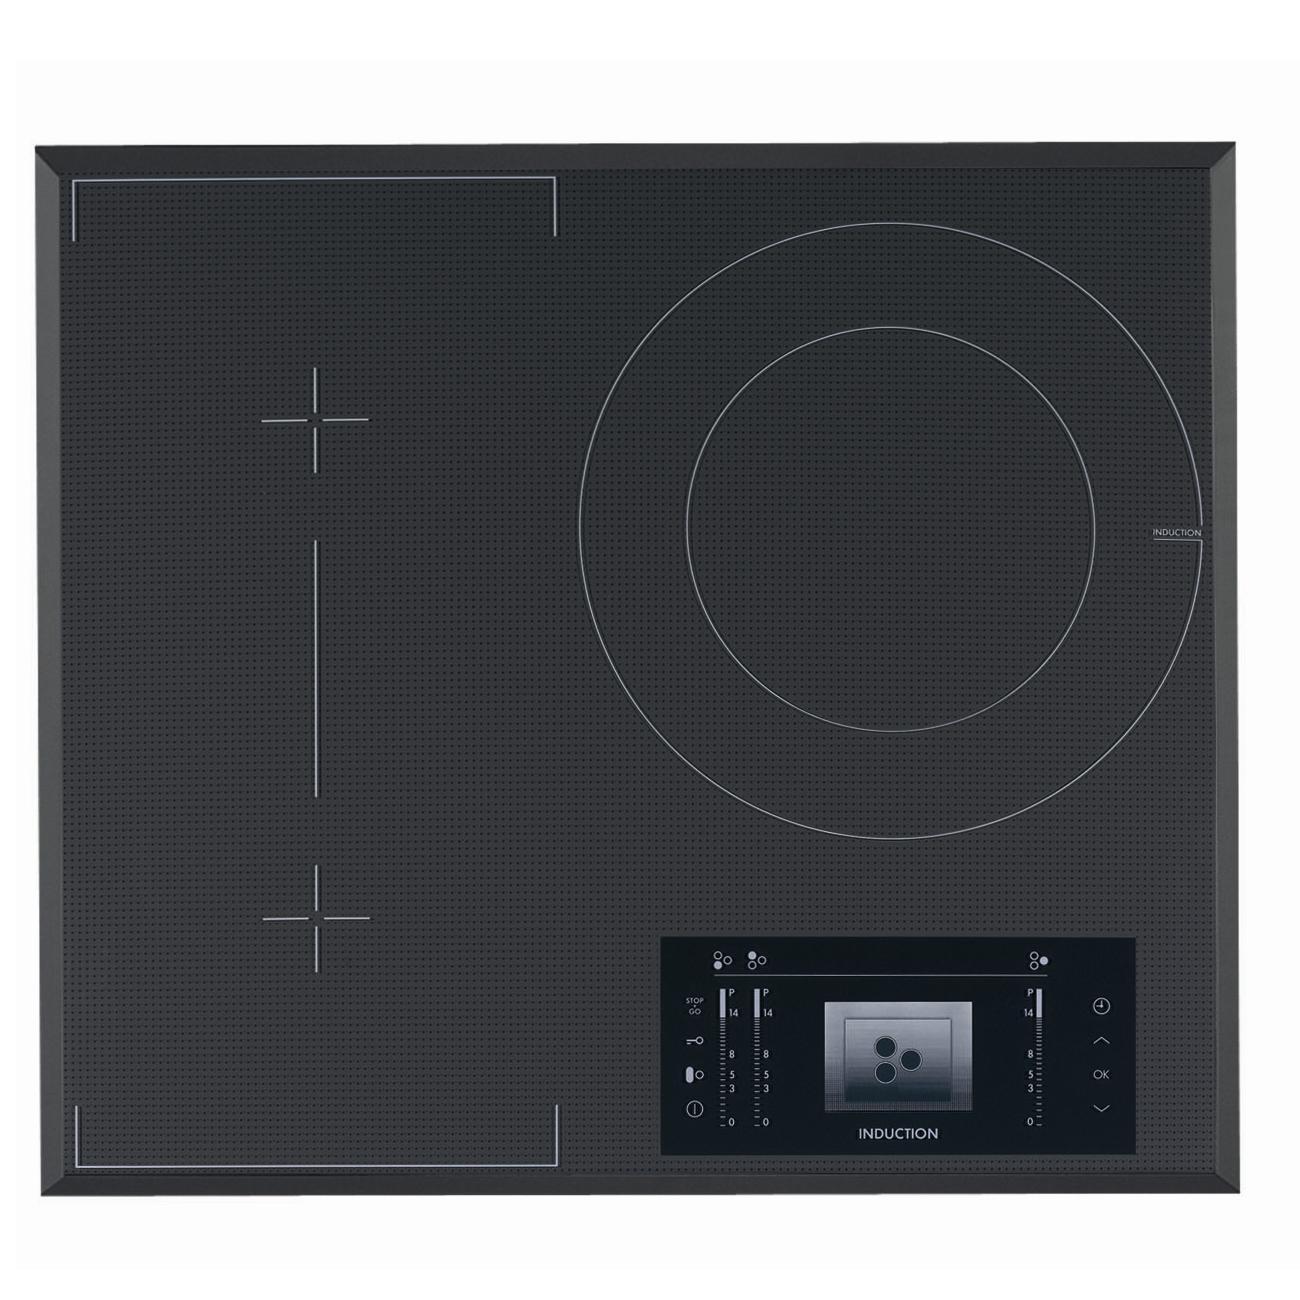 Plita incorporabila AEG HK683320FG, inductie, 4 arzatoare, gri